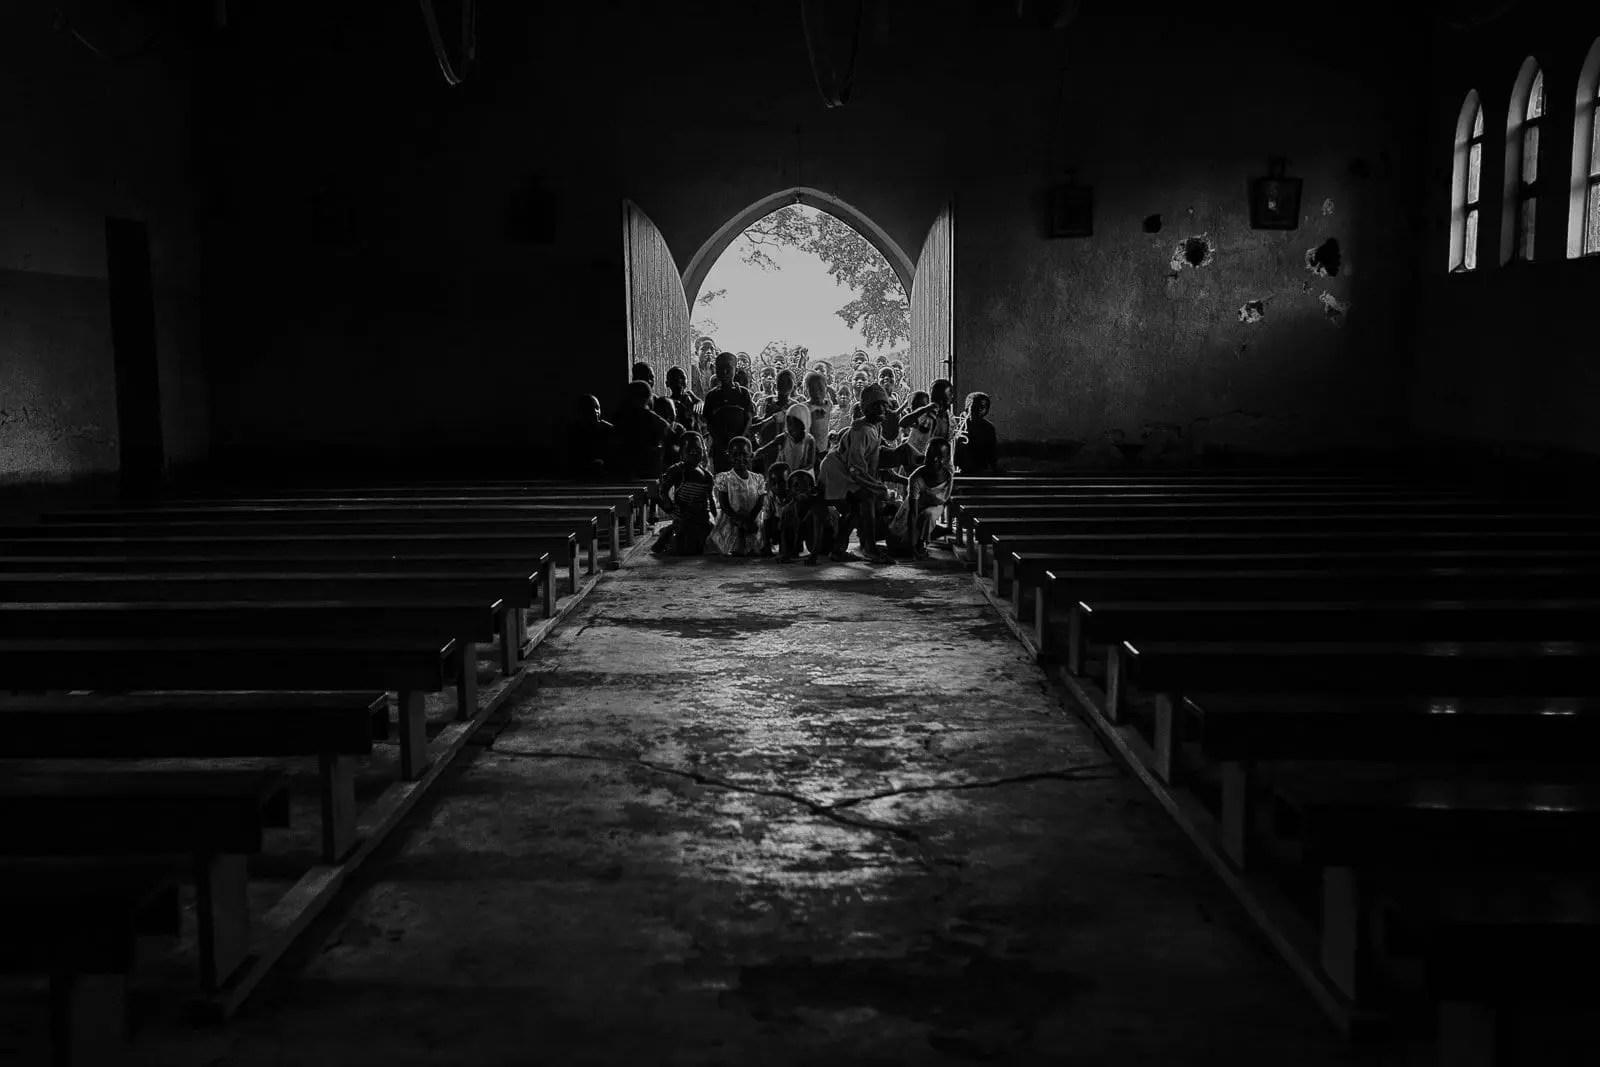 Kapanga (DRC) | © Gabriele Orlini, 2012